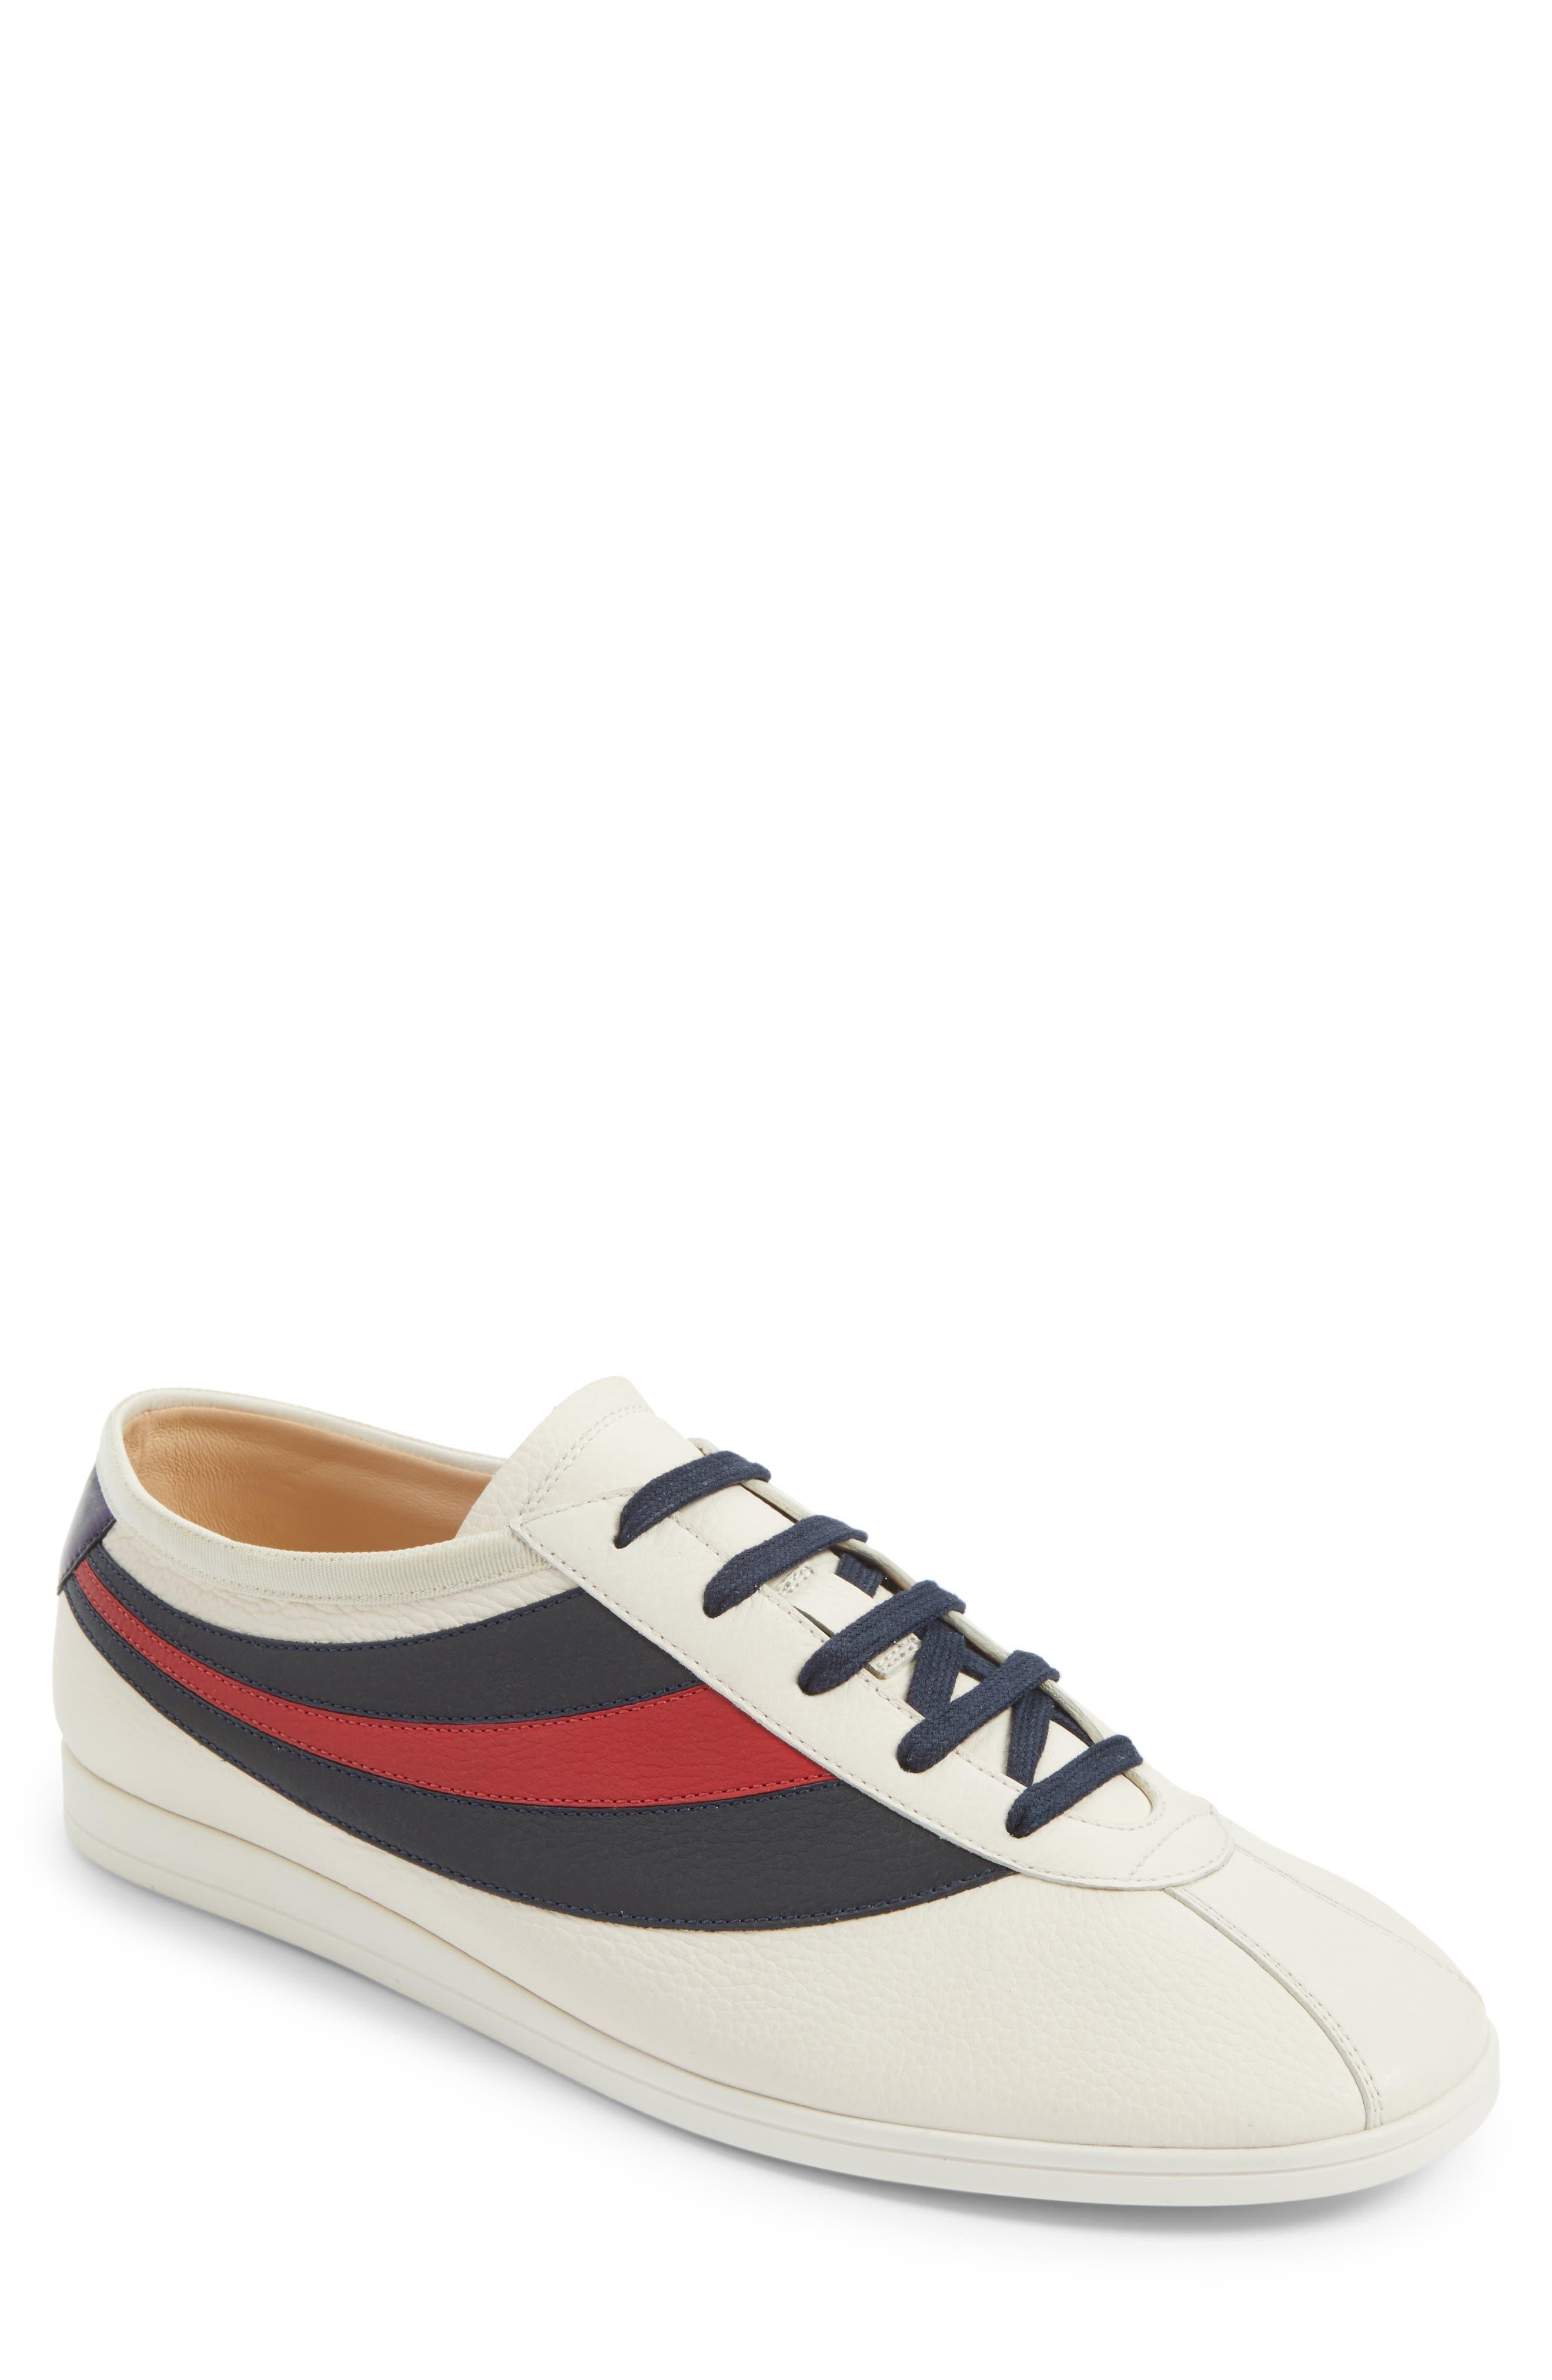 Alternate Image 1 Selected - Gucci Falacer Sneaker (Men)